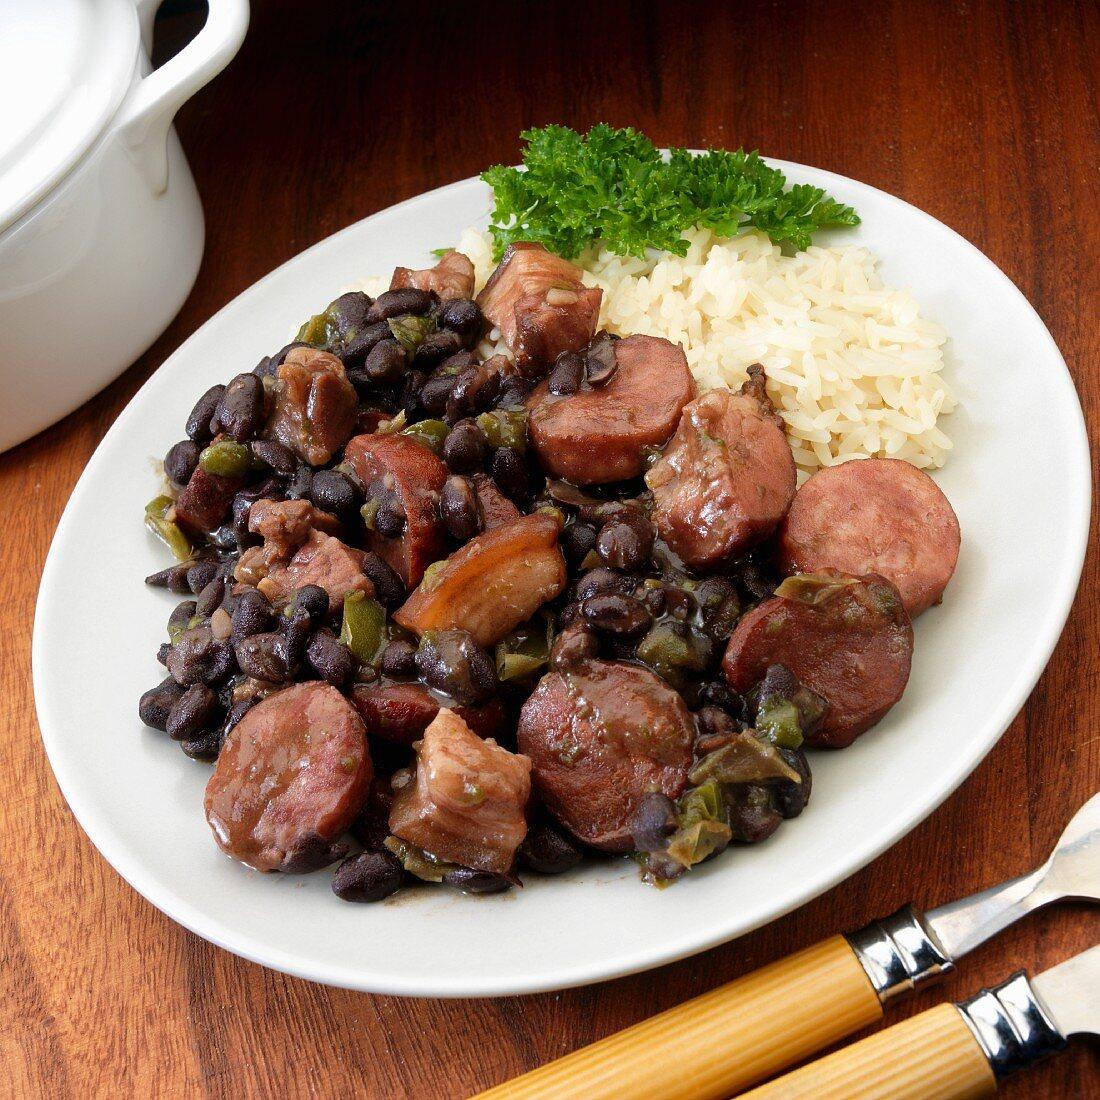 Brazillian Feijoada with black beans, chorizo, sausage, beef and smoked slab bacon